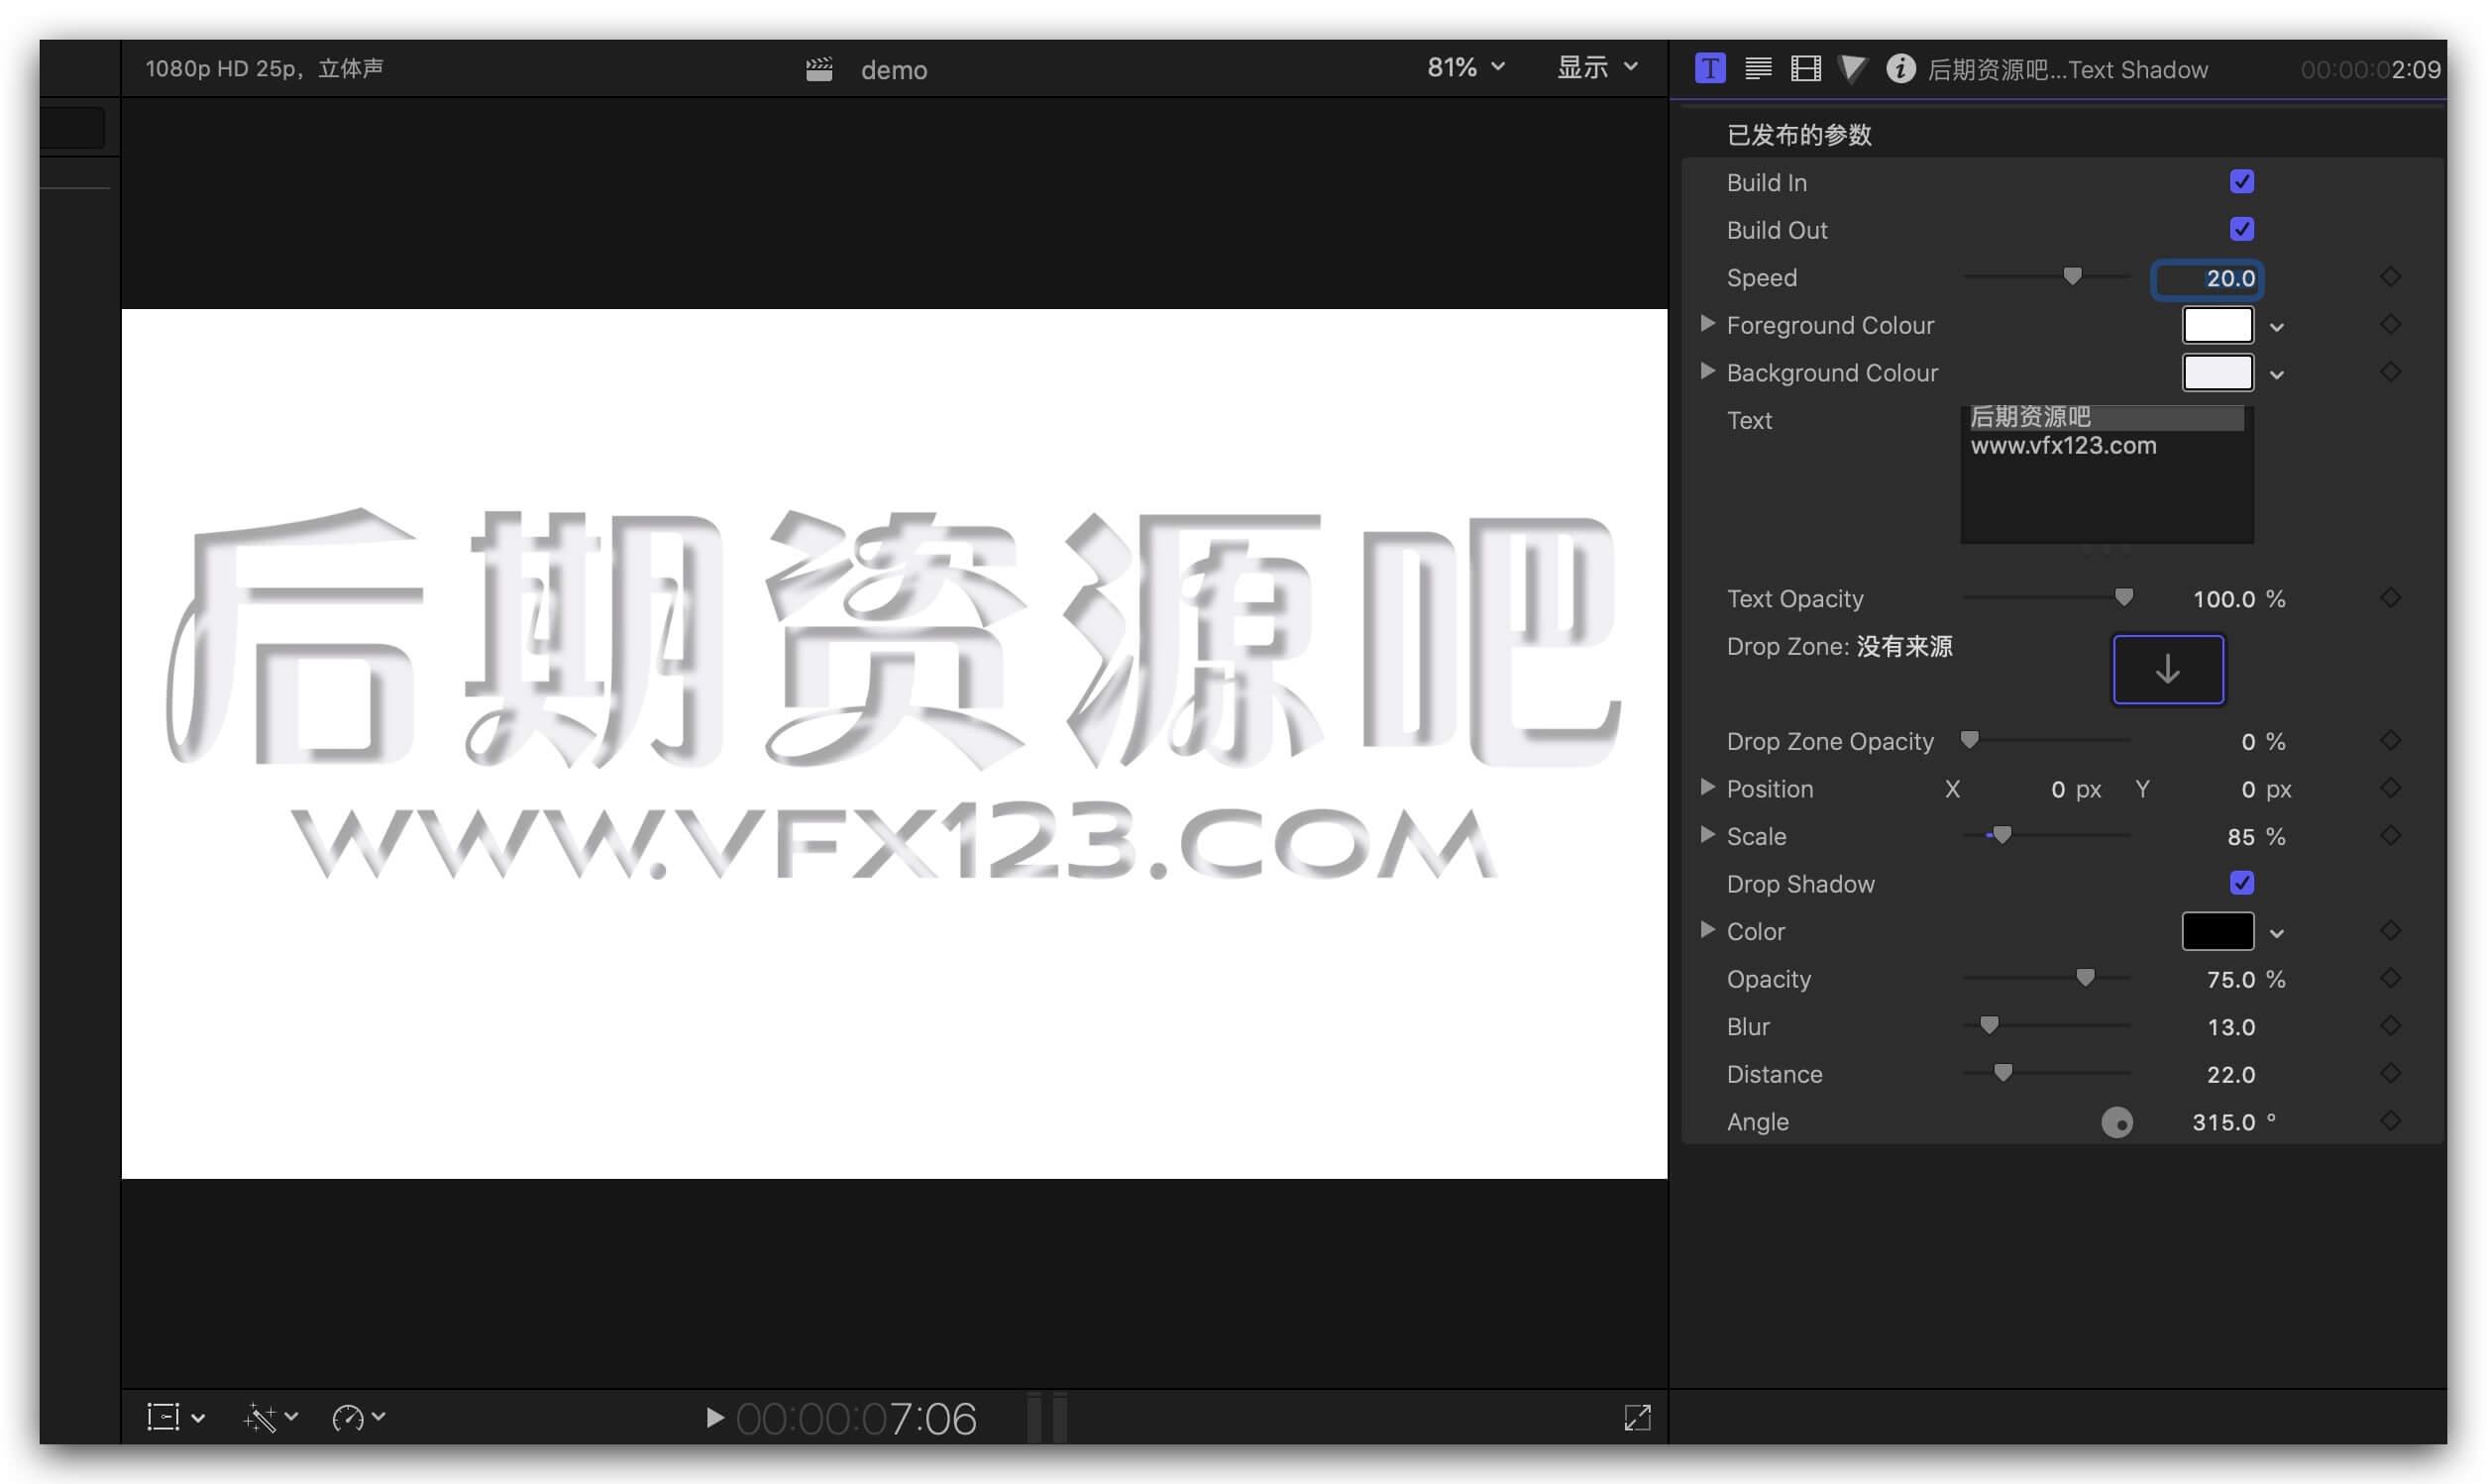 fcpx效果插件 为LOGO或文字添加内阴影制作立体效果工具 INSIDE TEXT SHADOW